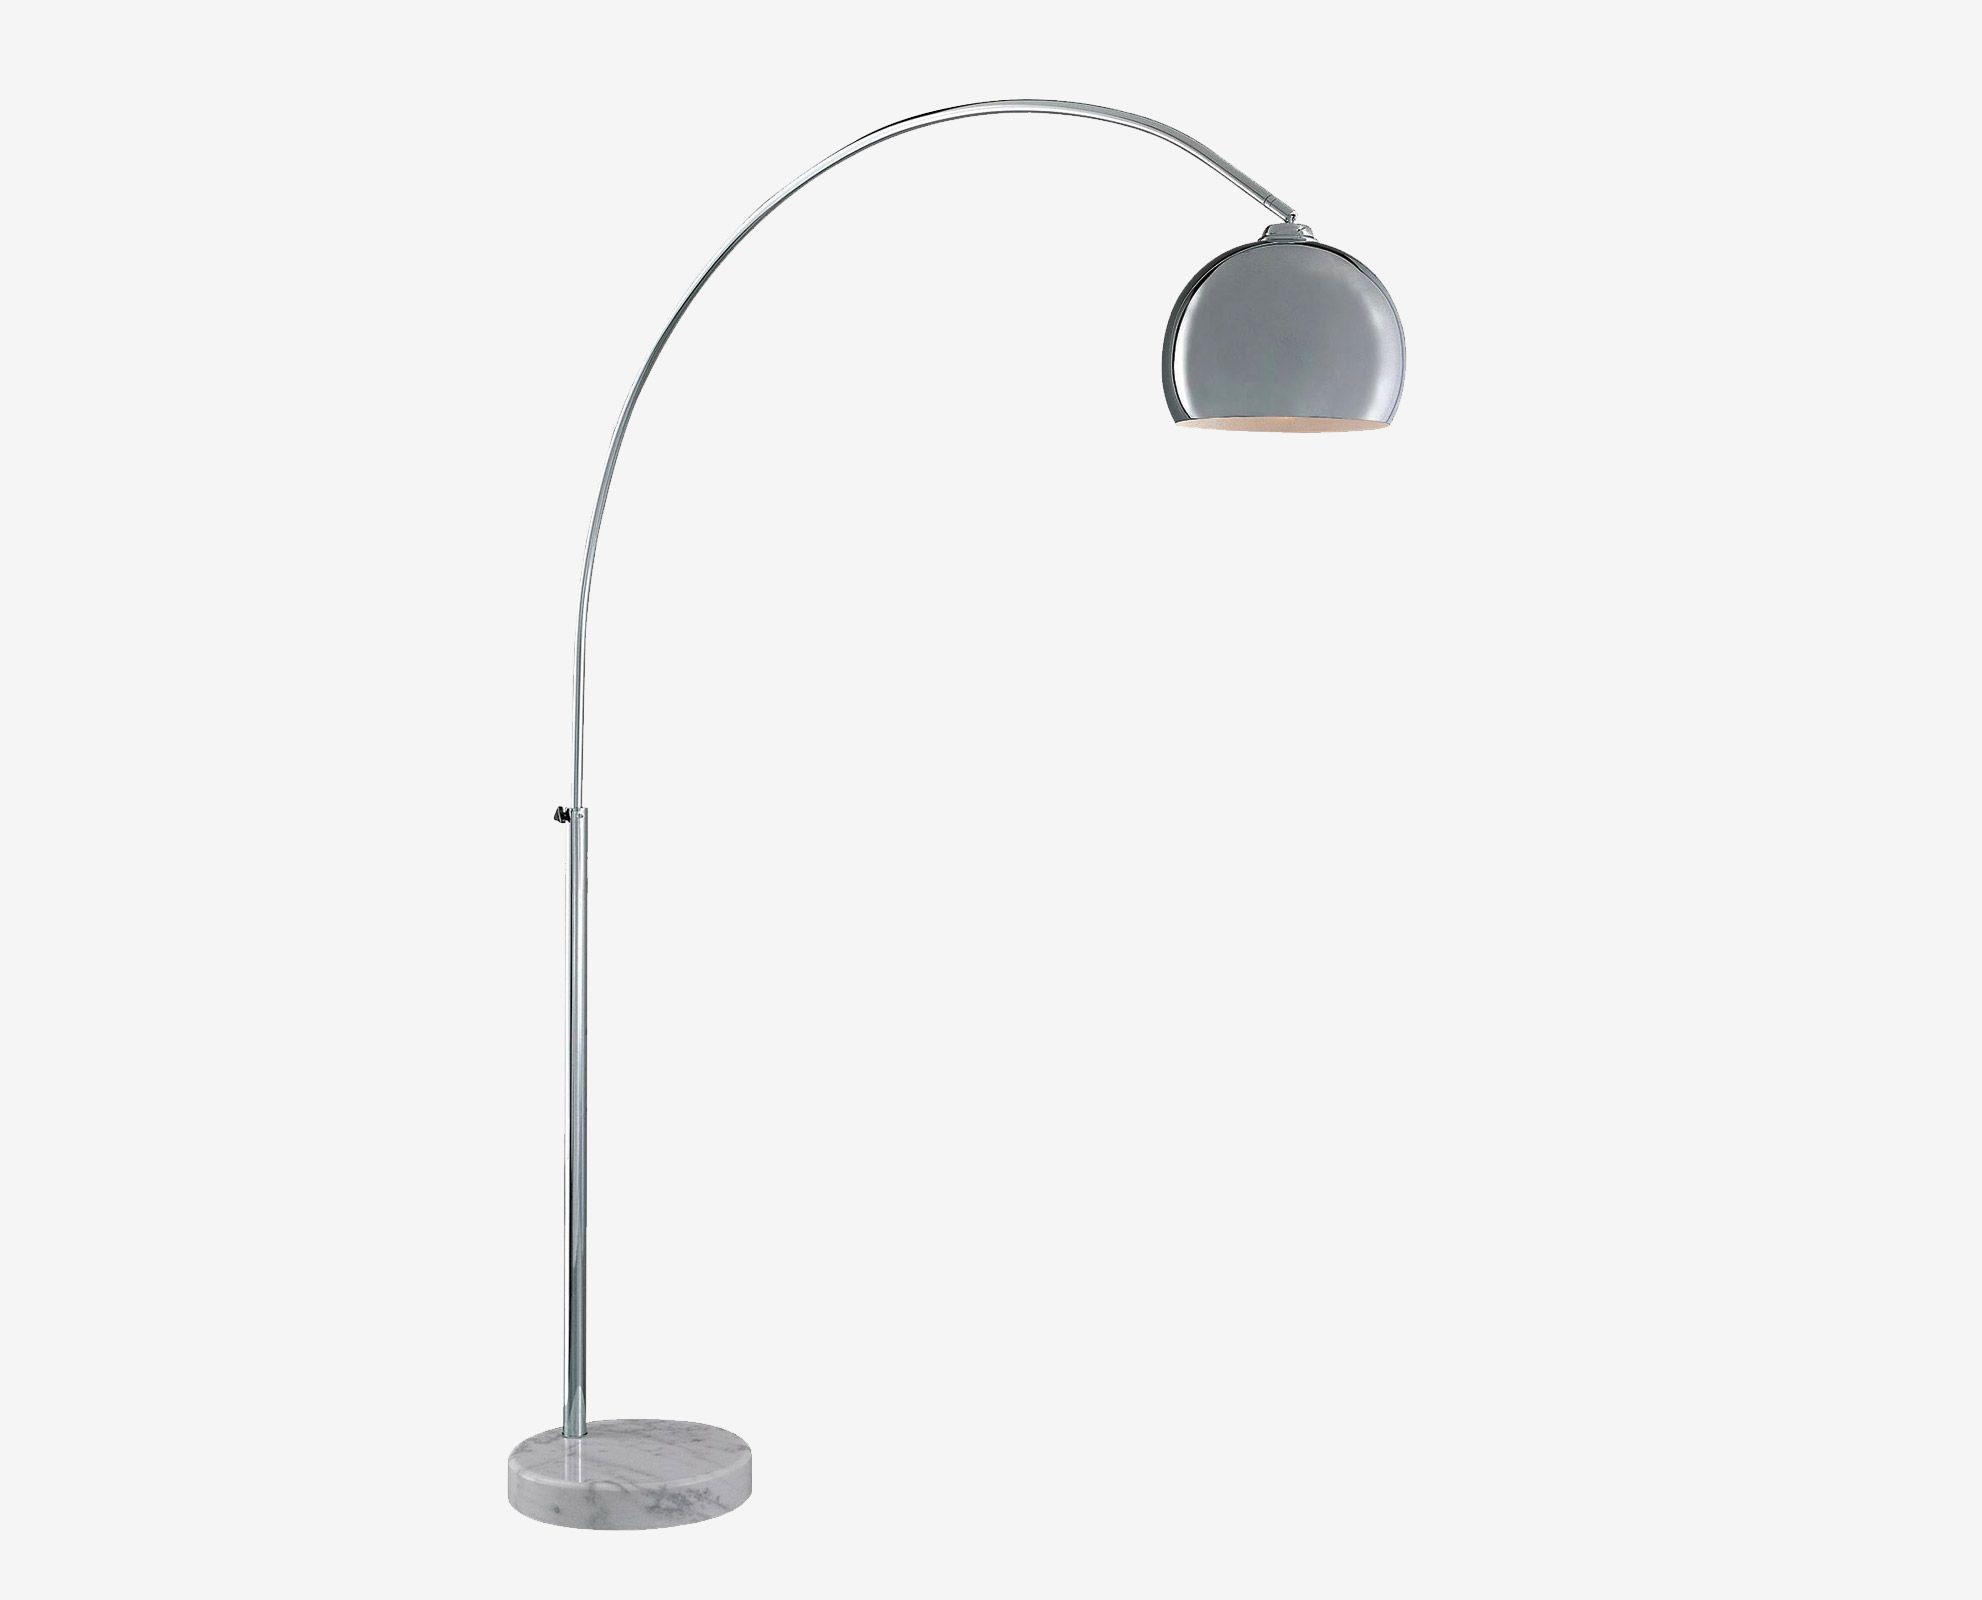 Floor Lamp 1950s Swedish Floor Lamp Lamp Contemporary Furniture Design